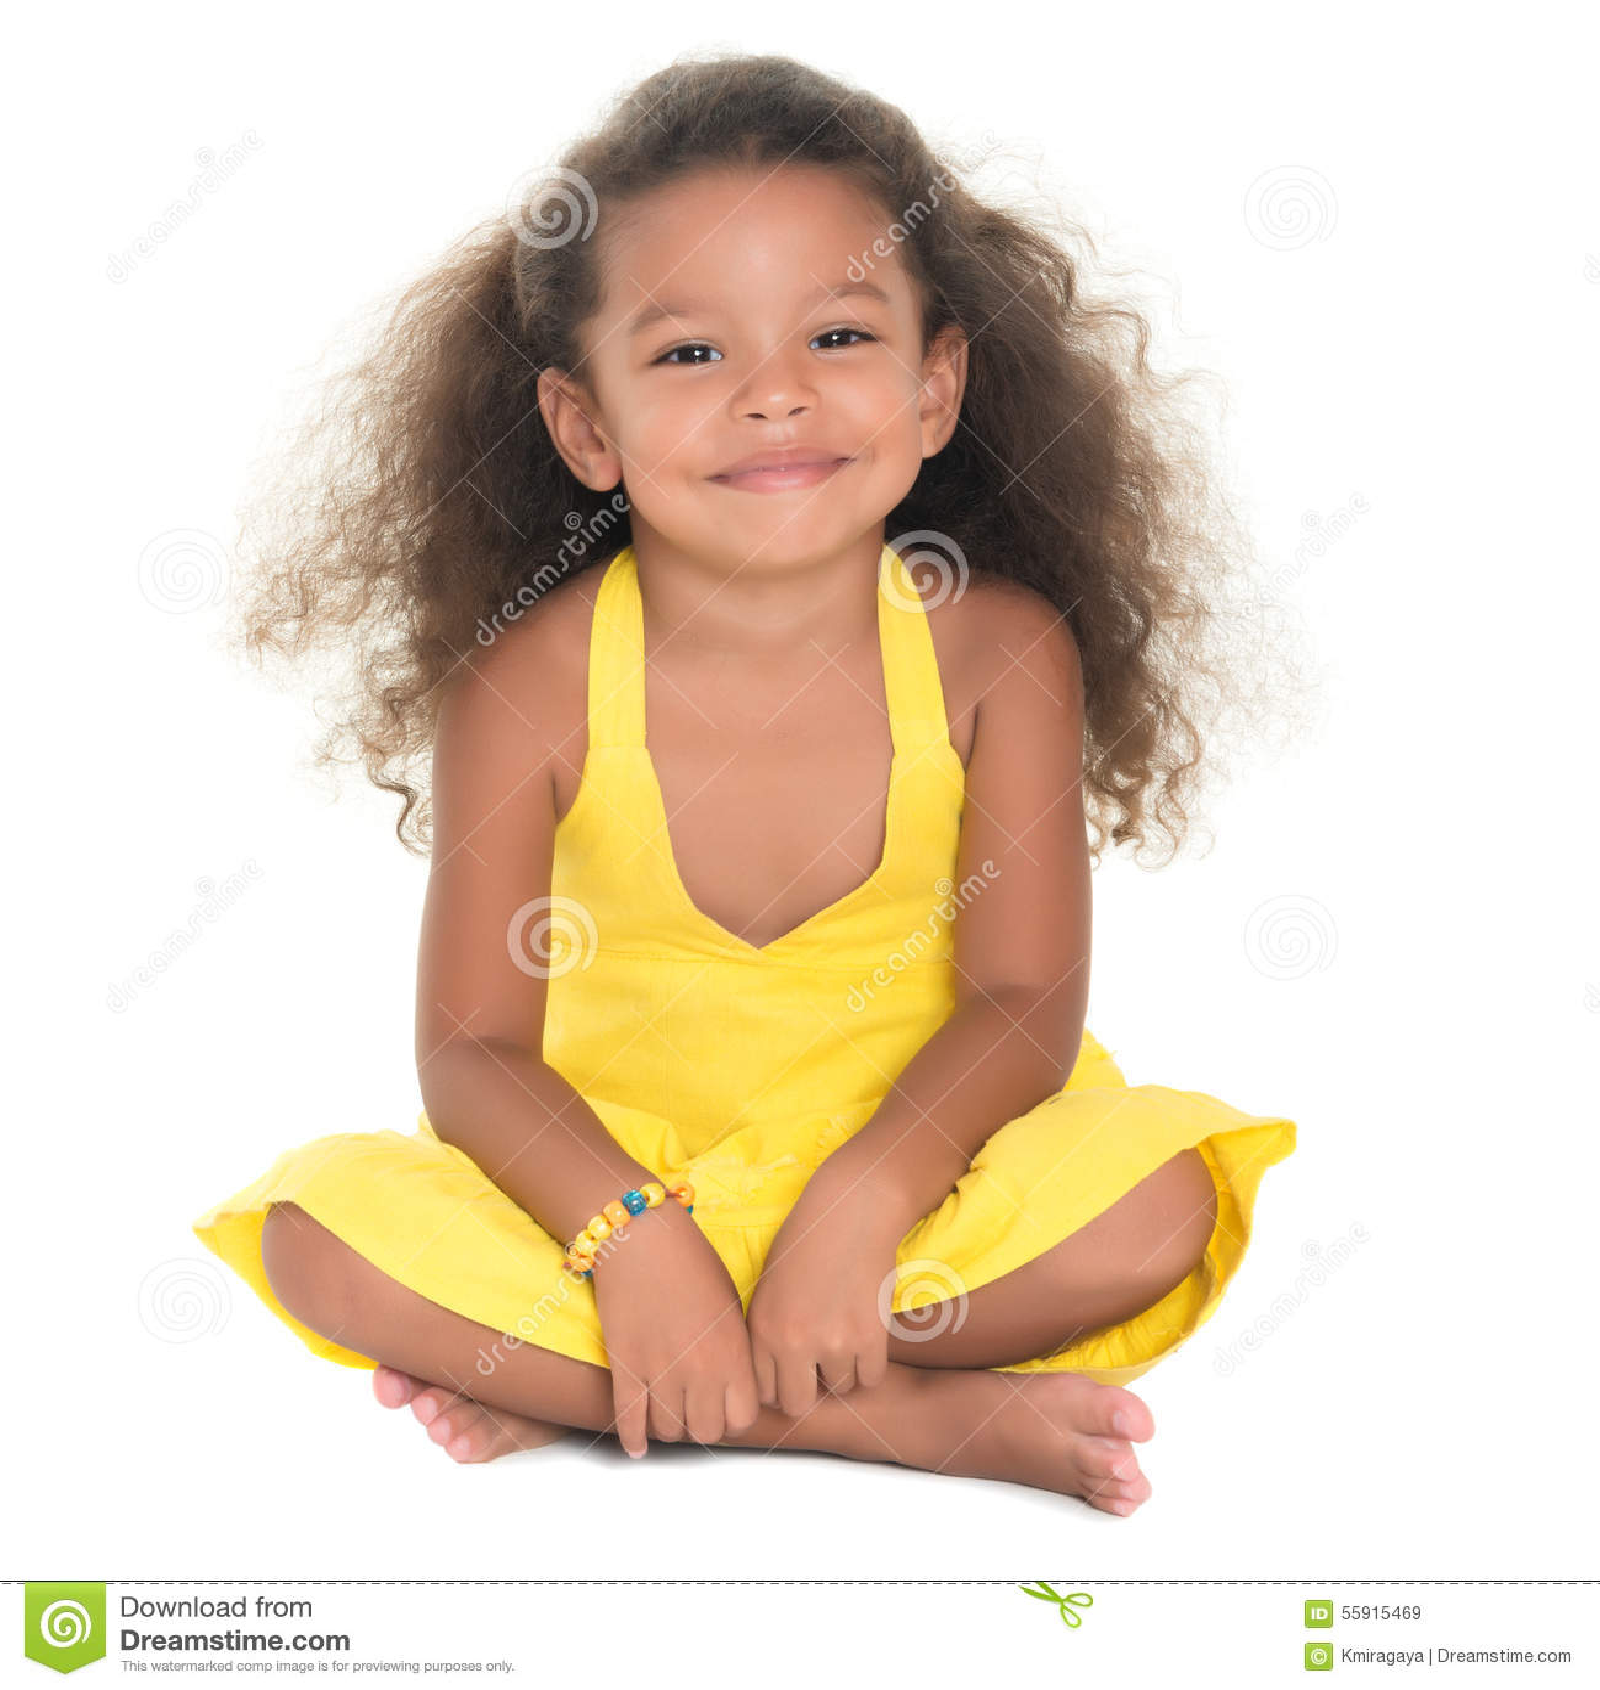 Small And Beautiful Bathrooms: Beautiful Small Hispanic Girl Sitting On The Floor Stock